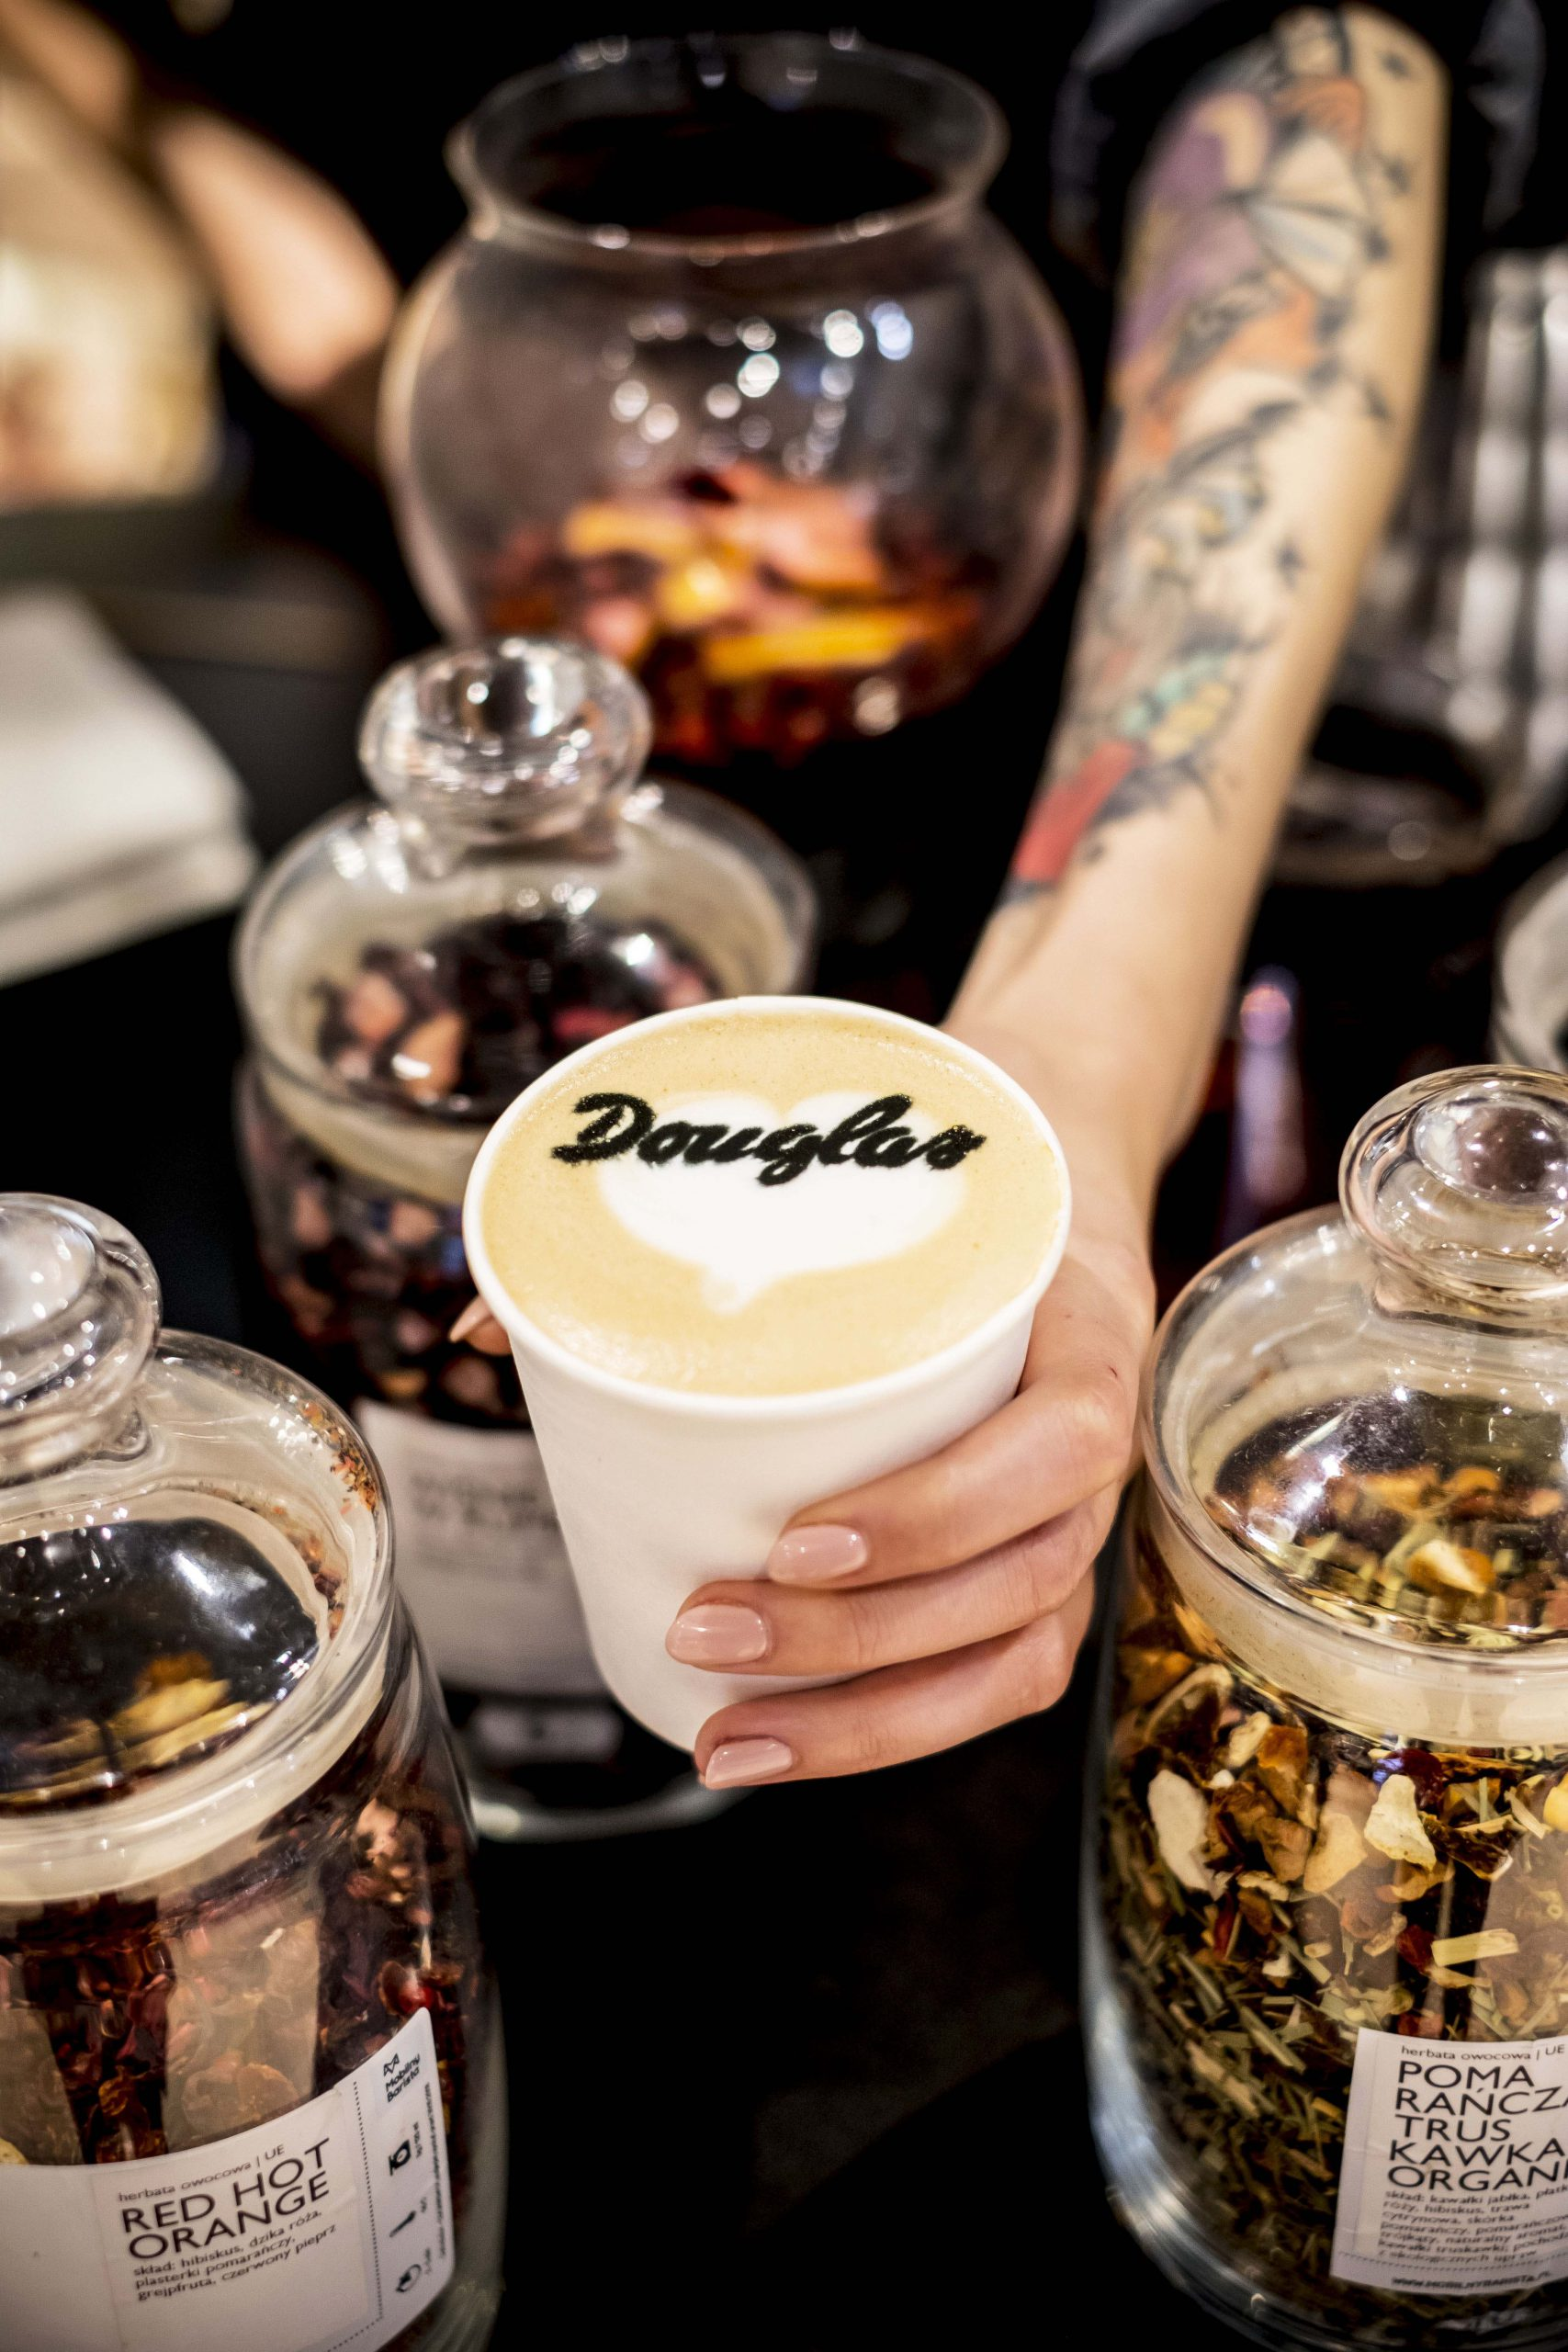 swiezo mielona kawa na otwarcie sklepu douglas